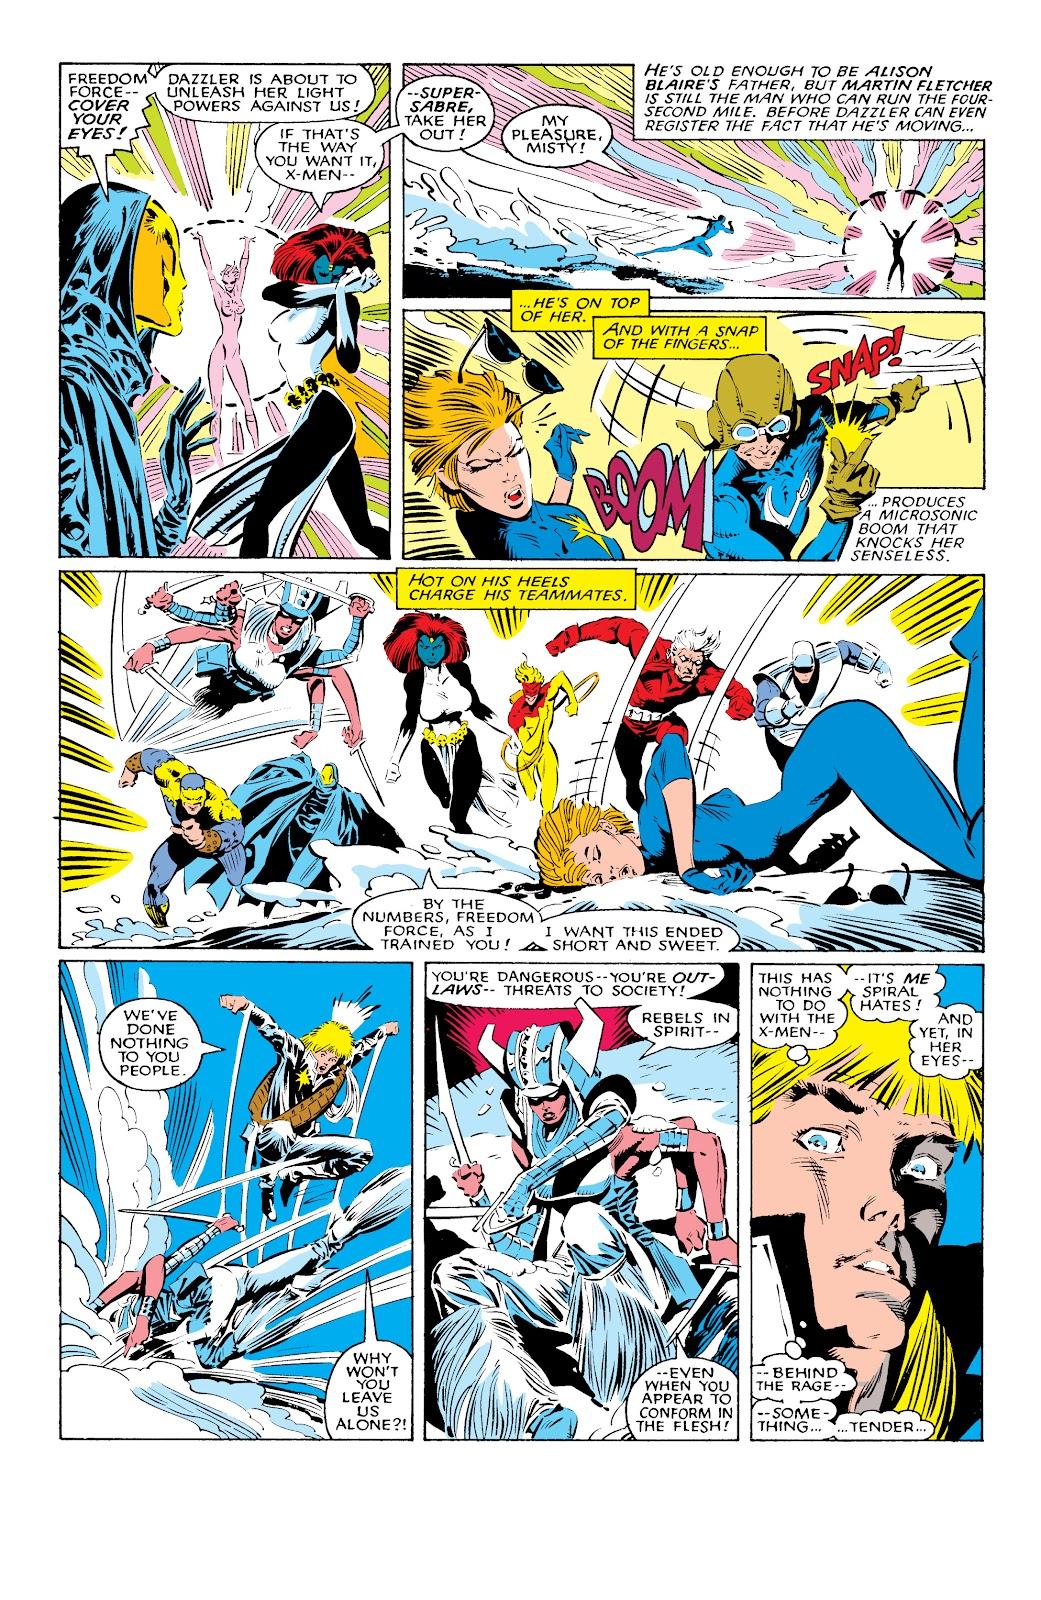 Read online X-Men Milestones: Fall of the Mutants comic -  Issue # TPB (Part 1) - 21